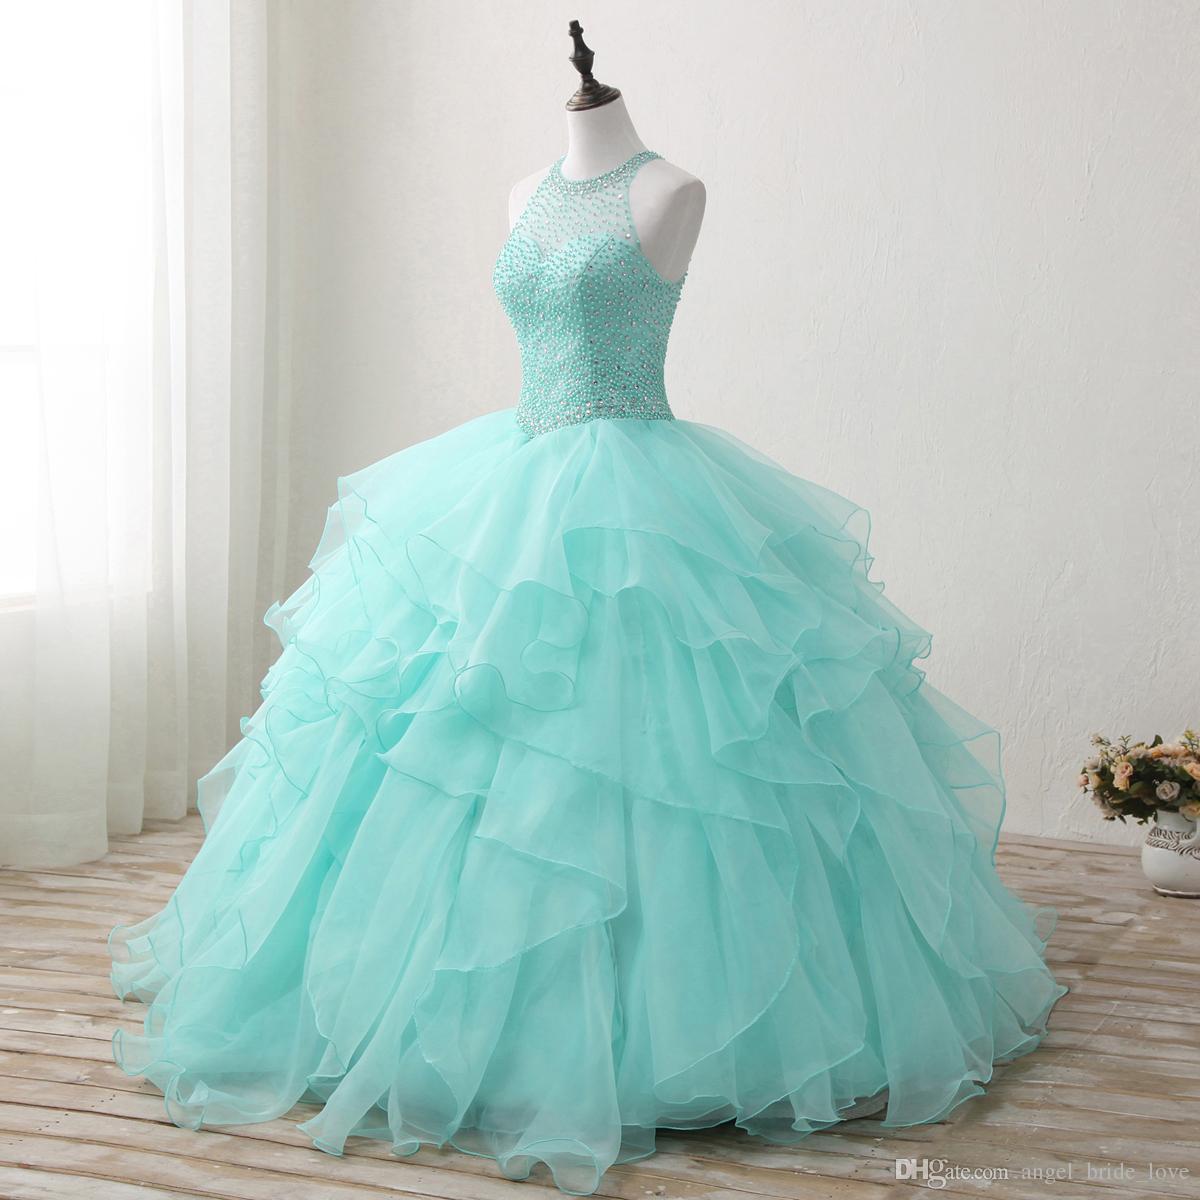 2018 Yeni Yüksek Qullity Nane Yeşil Balo Quinceanera elbise Boncuklu Balo Tatlı 16 Elbise Artı Boyutu Dantel Up Vestido De 15 Ano Q72